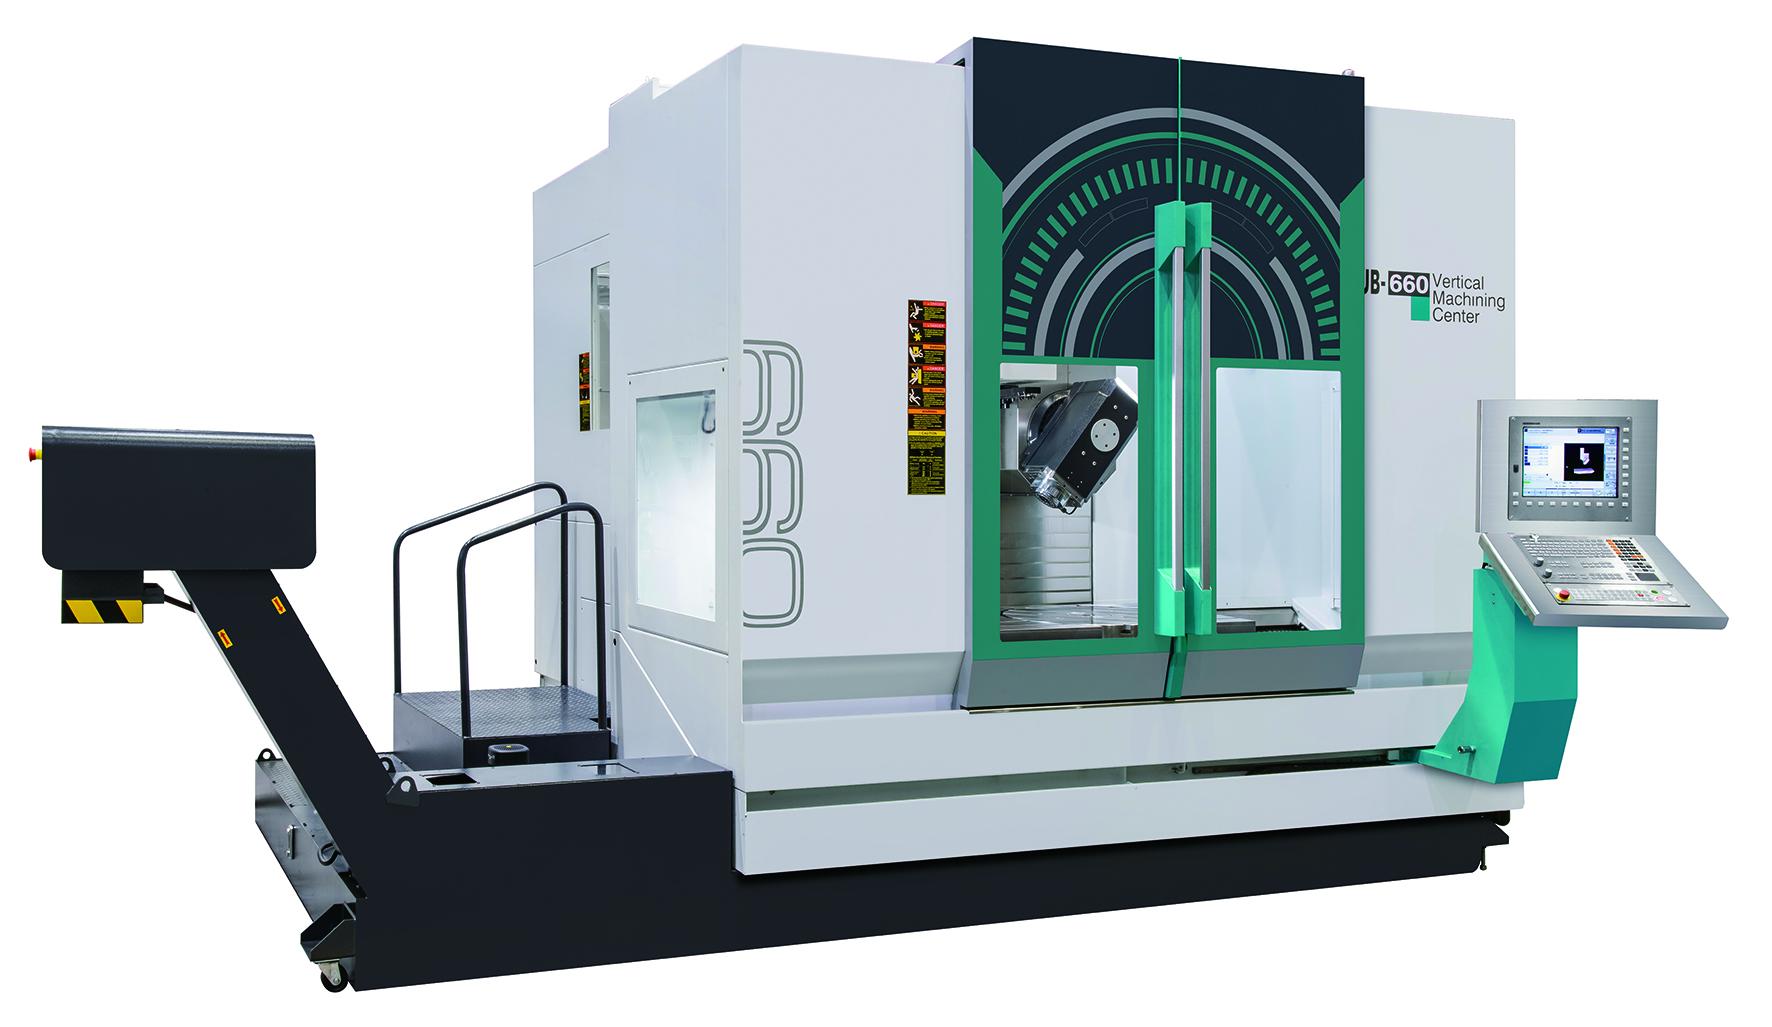 UB-660  5-Axis Vertical Machining Center